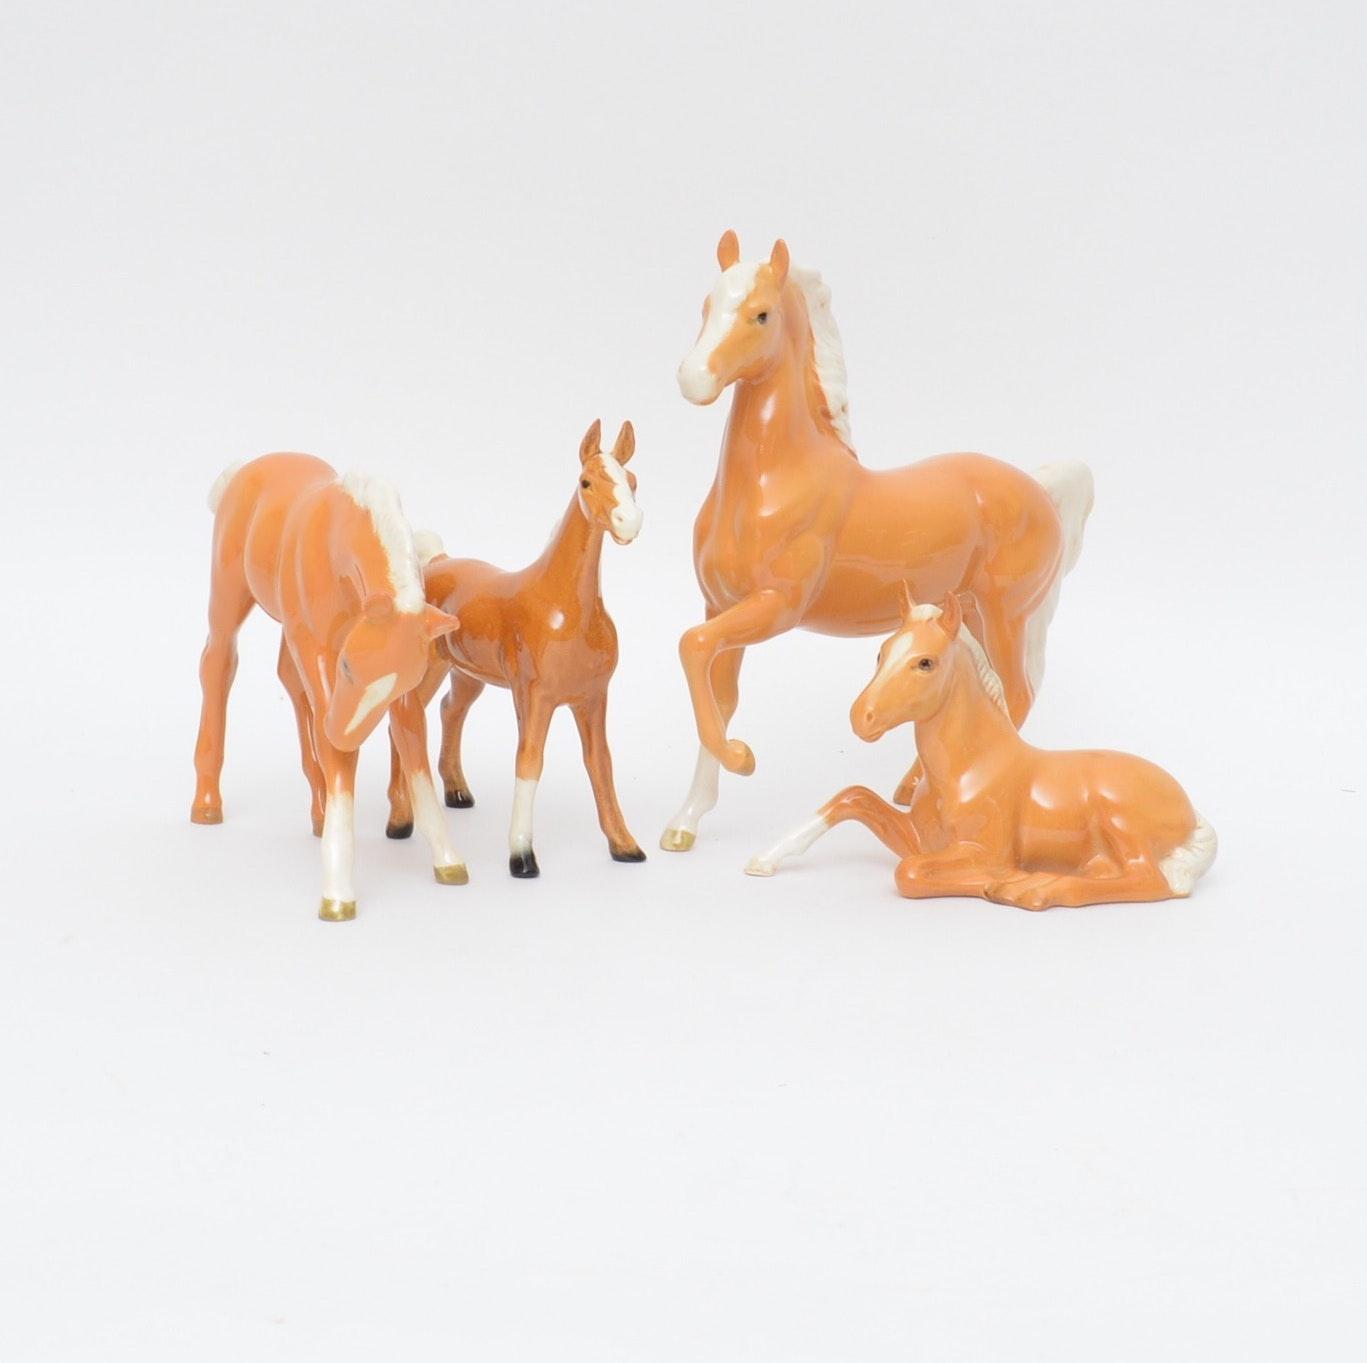 Beswick Porcelain Horse Figurines